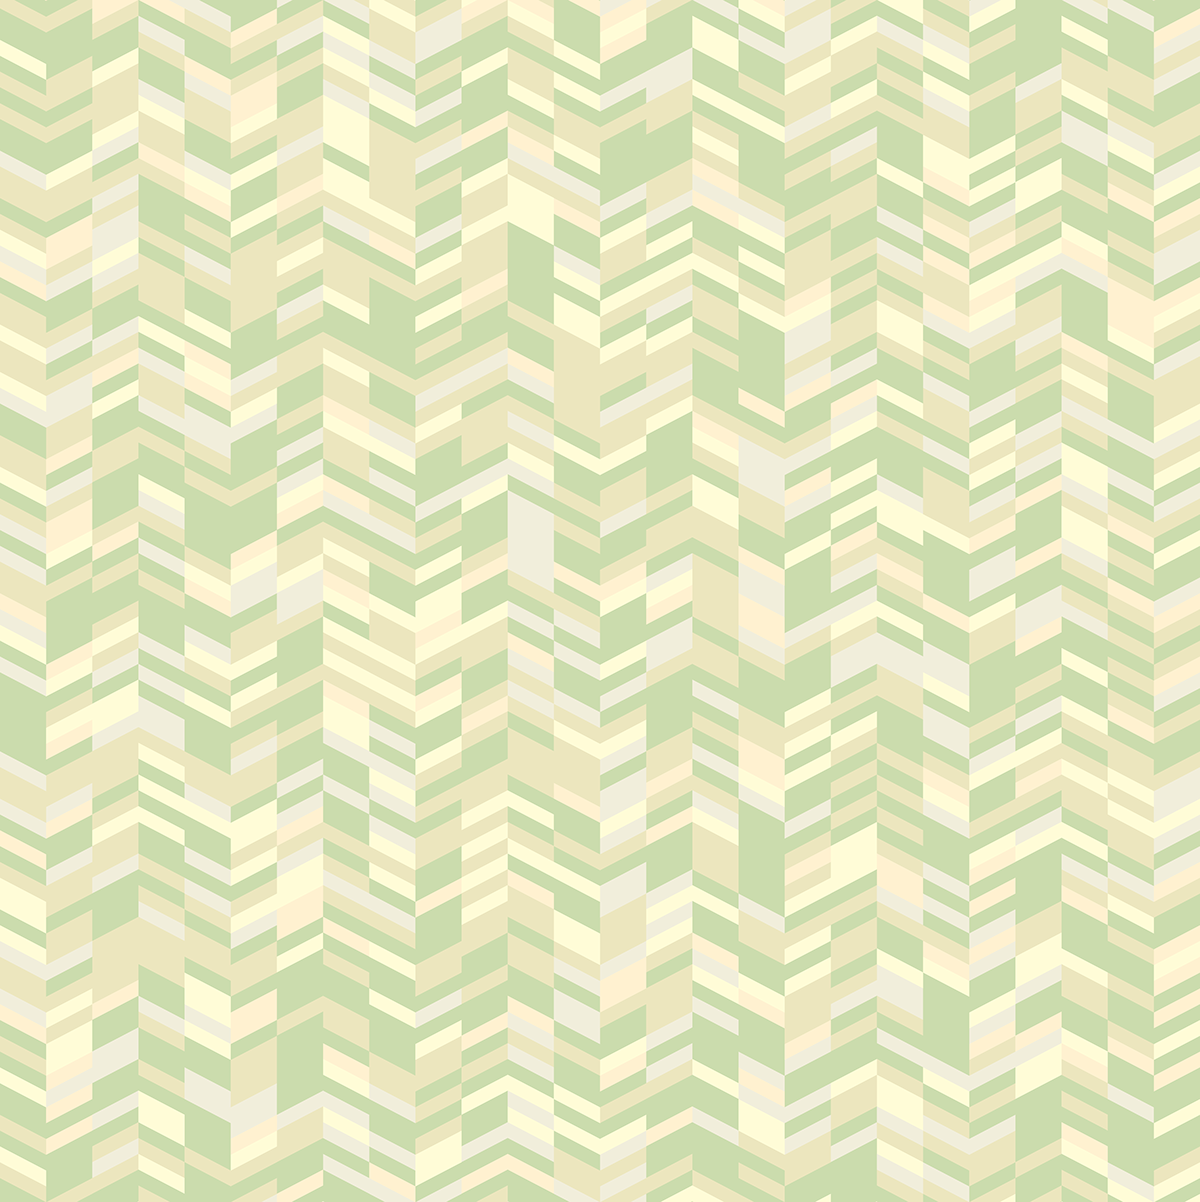 pattern explore 02